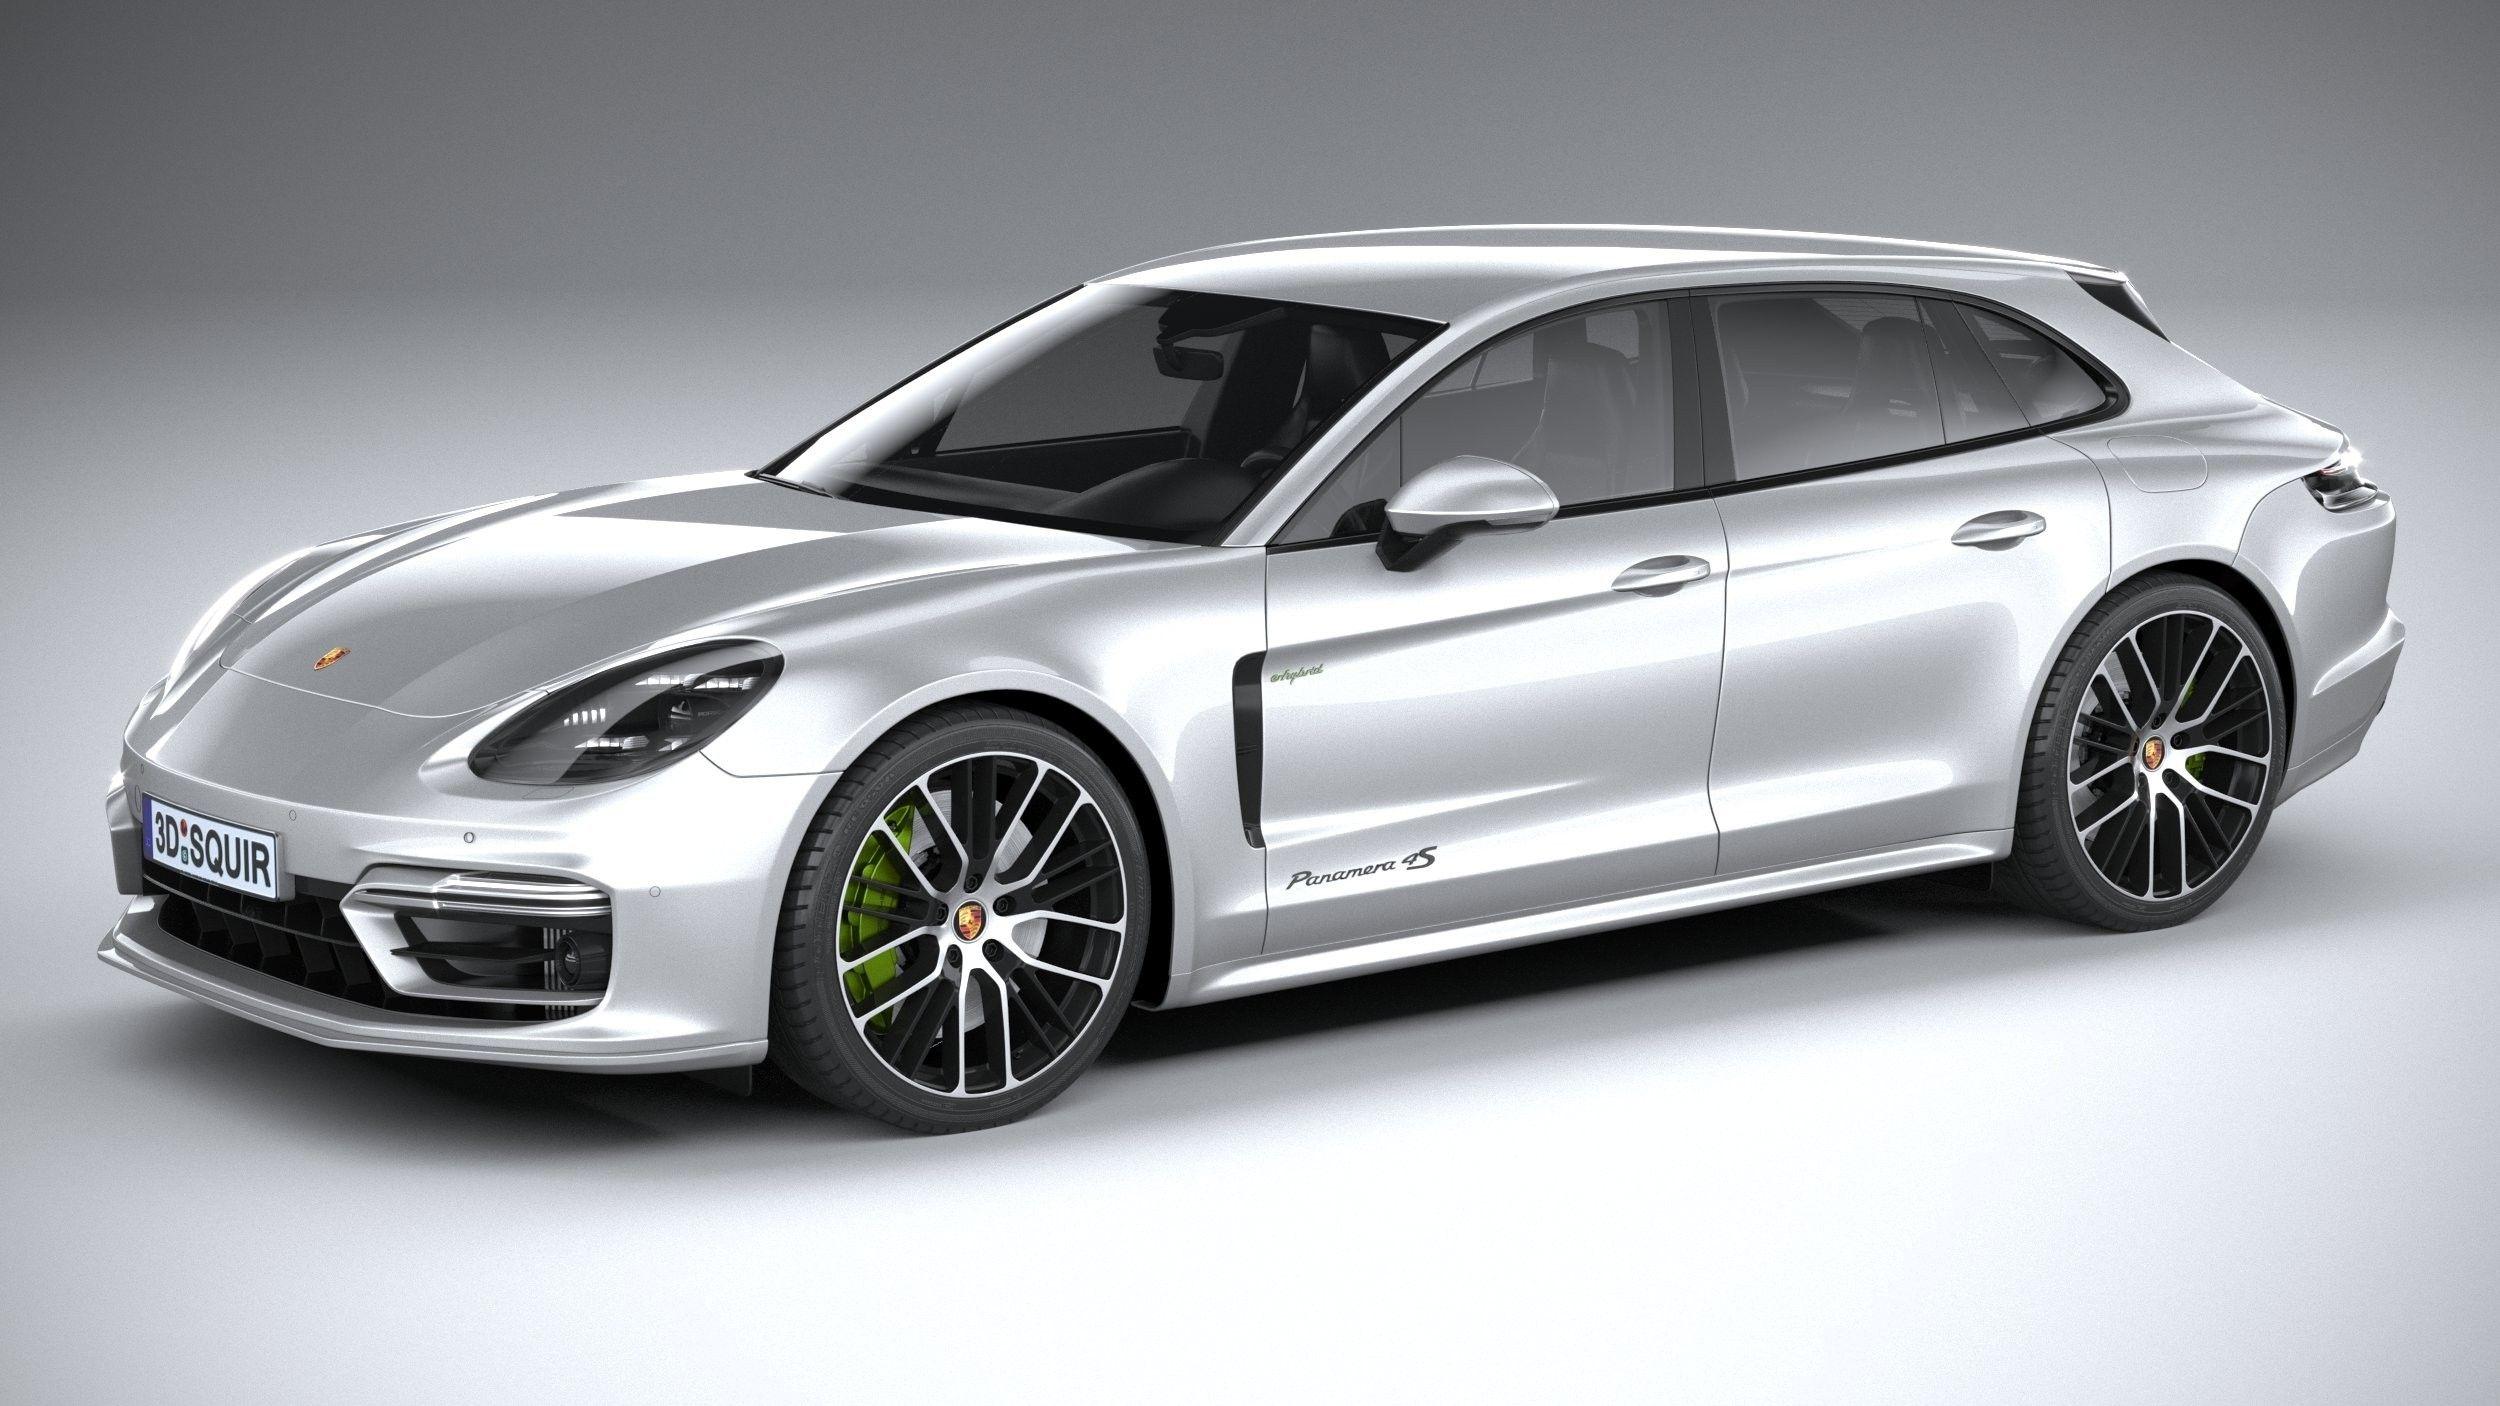 Porsche Panamera 4 E Hybrid Sport Turismo 2021 Porsche Panamera Porsche Panamera 4 Porsche